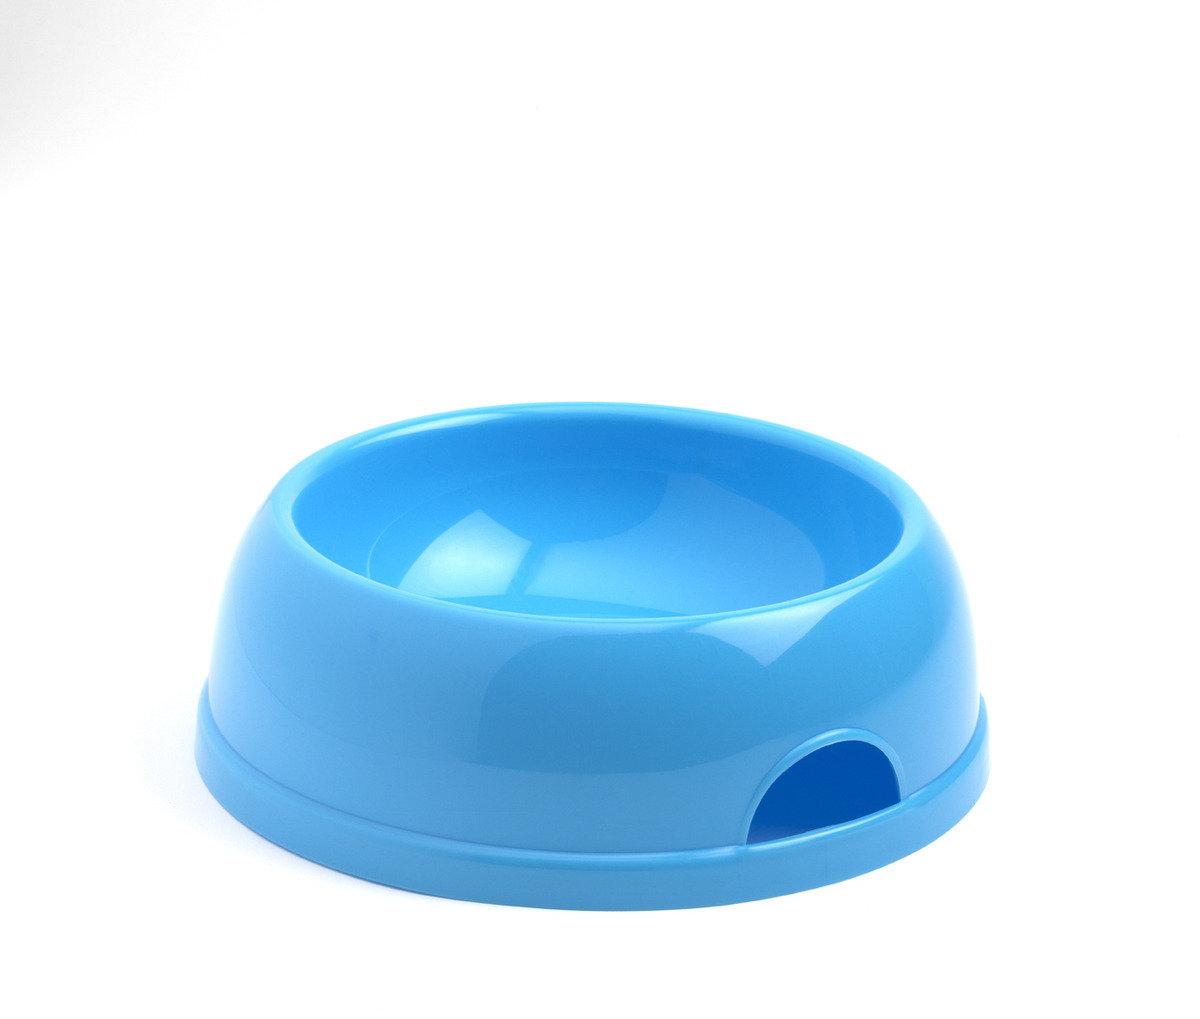 Eco Bowl  寵物碗 H113  - 鮮藍色